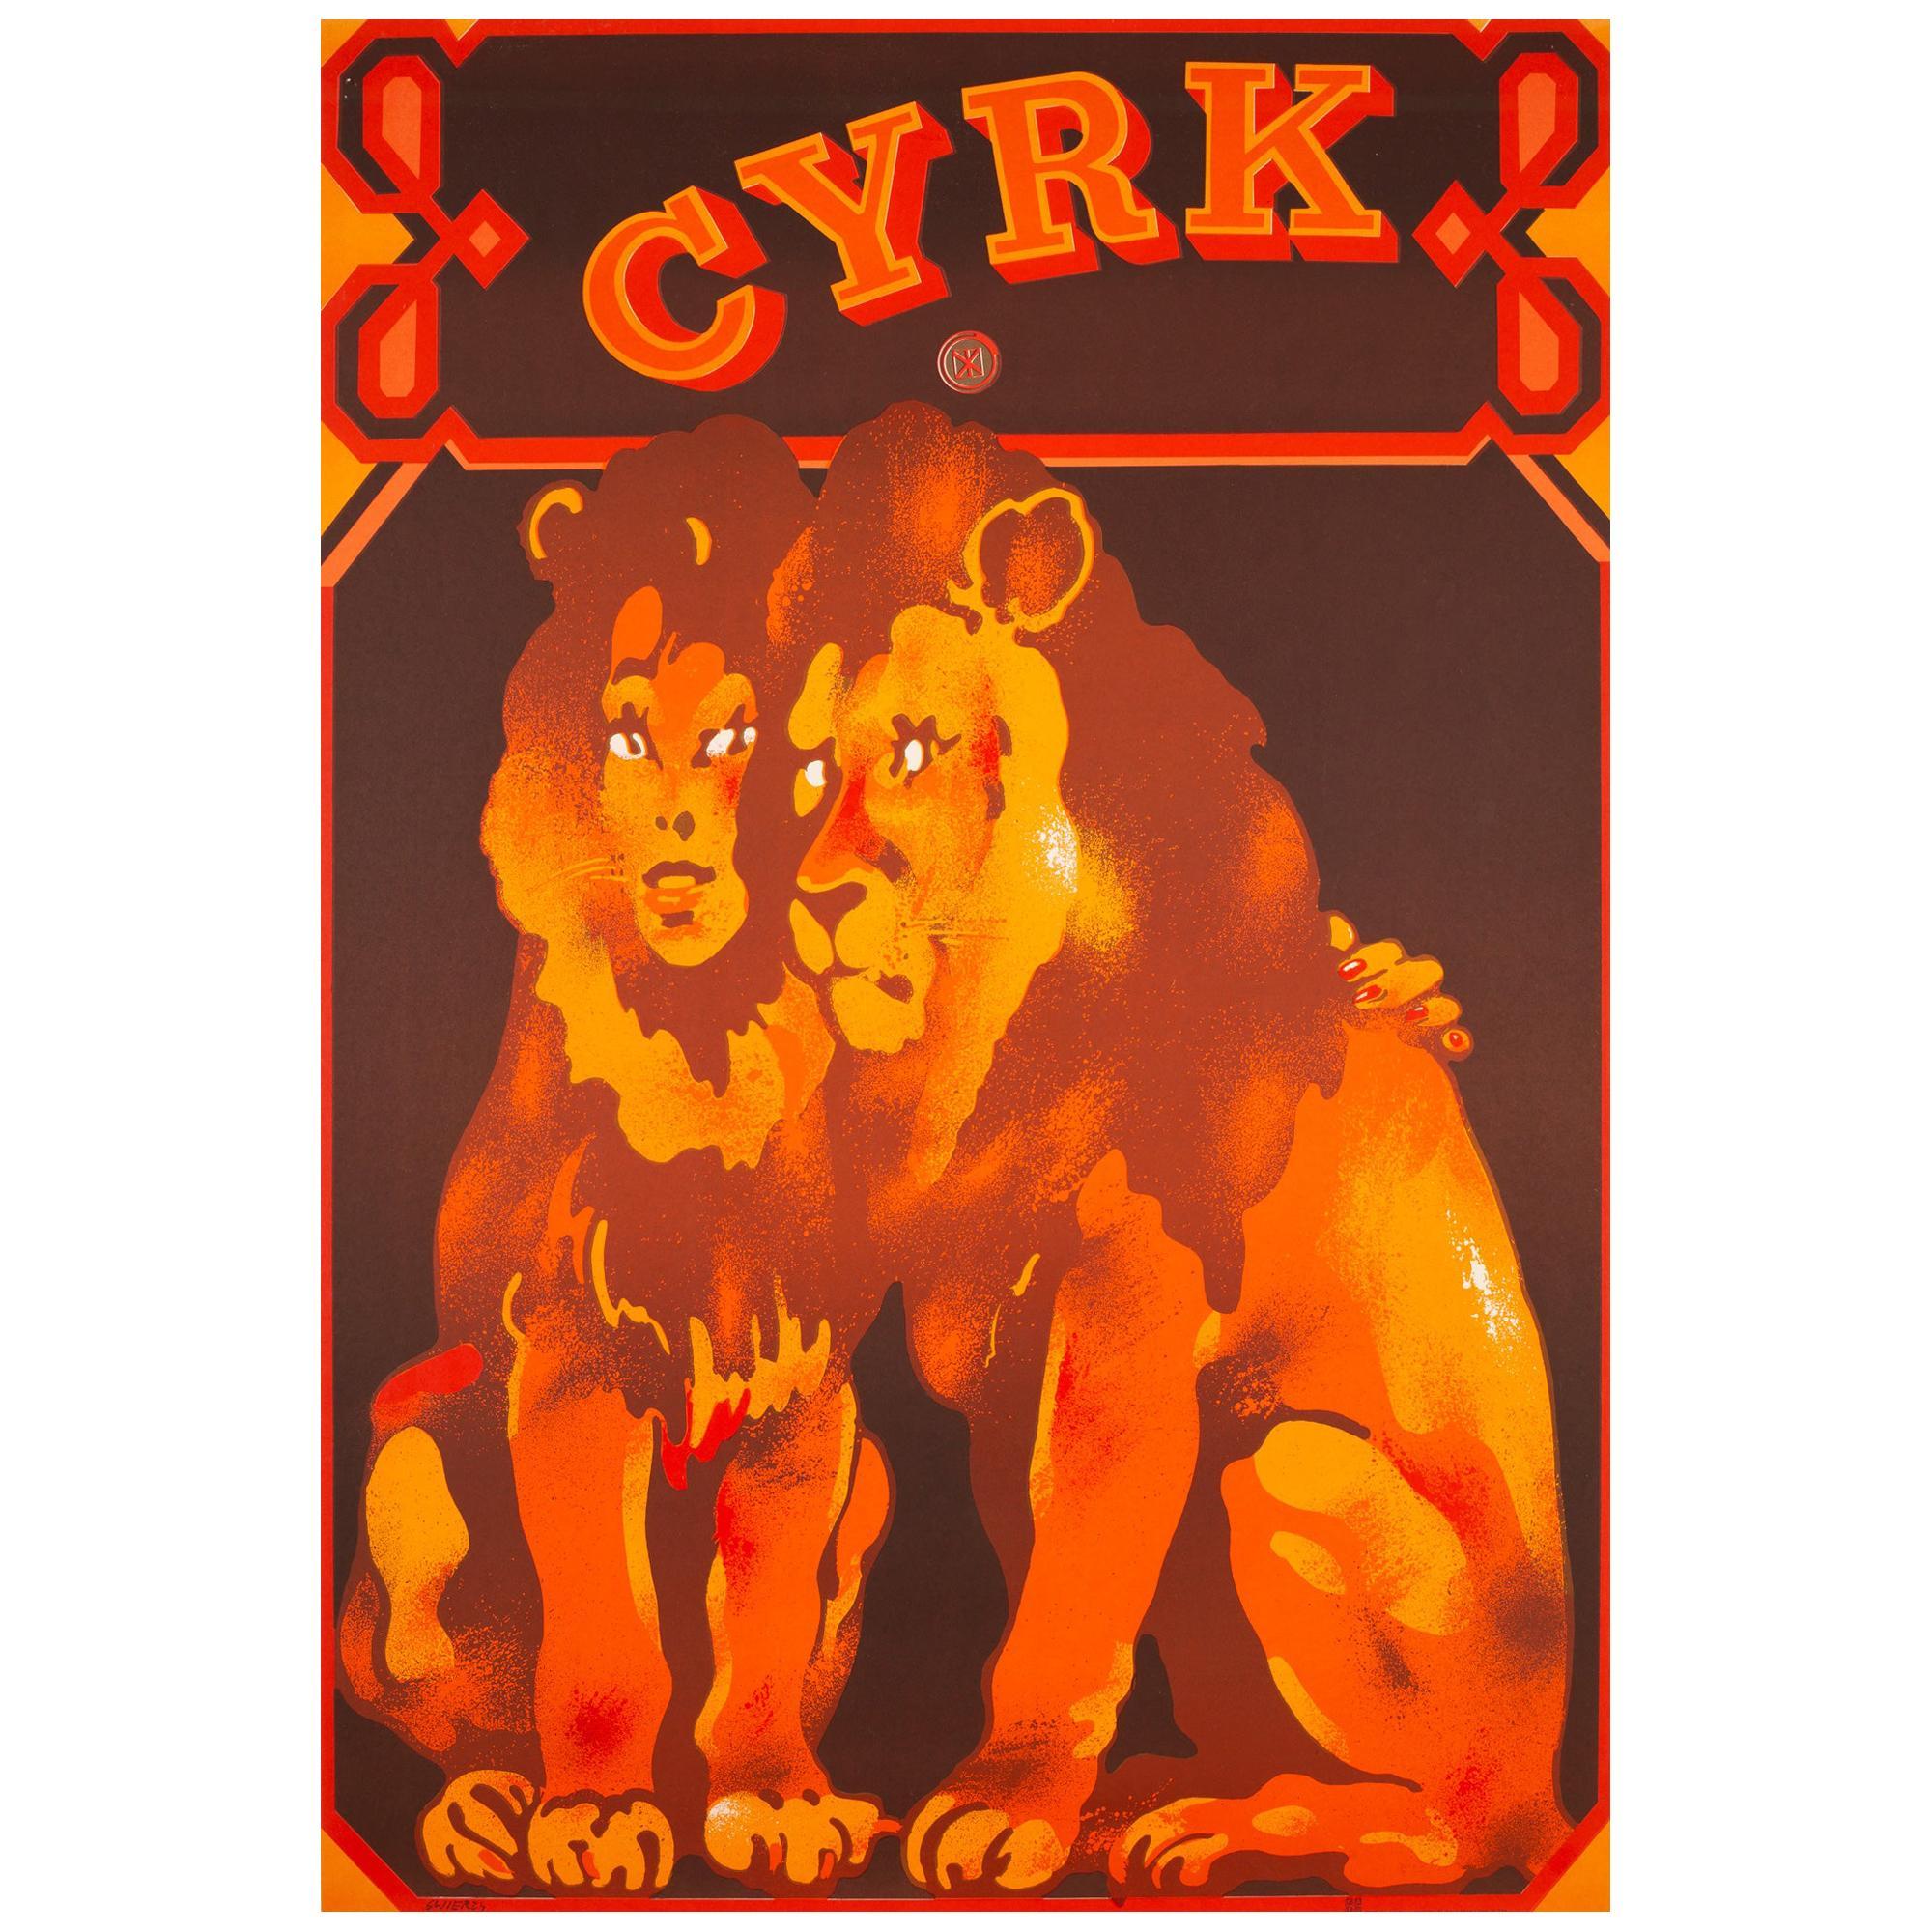 Cyrk Lion Lovers 1975 Polish Circus Poster, Swierzy